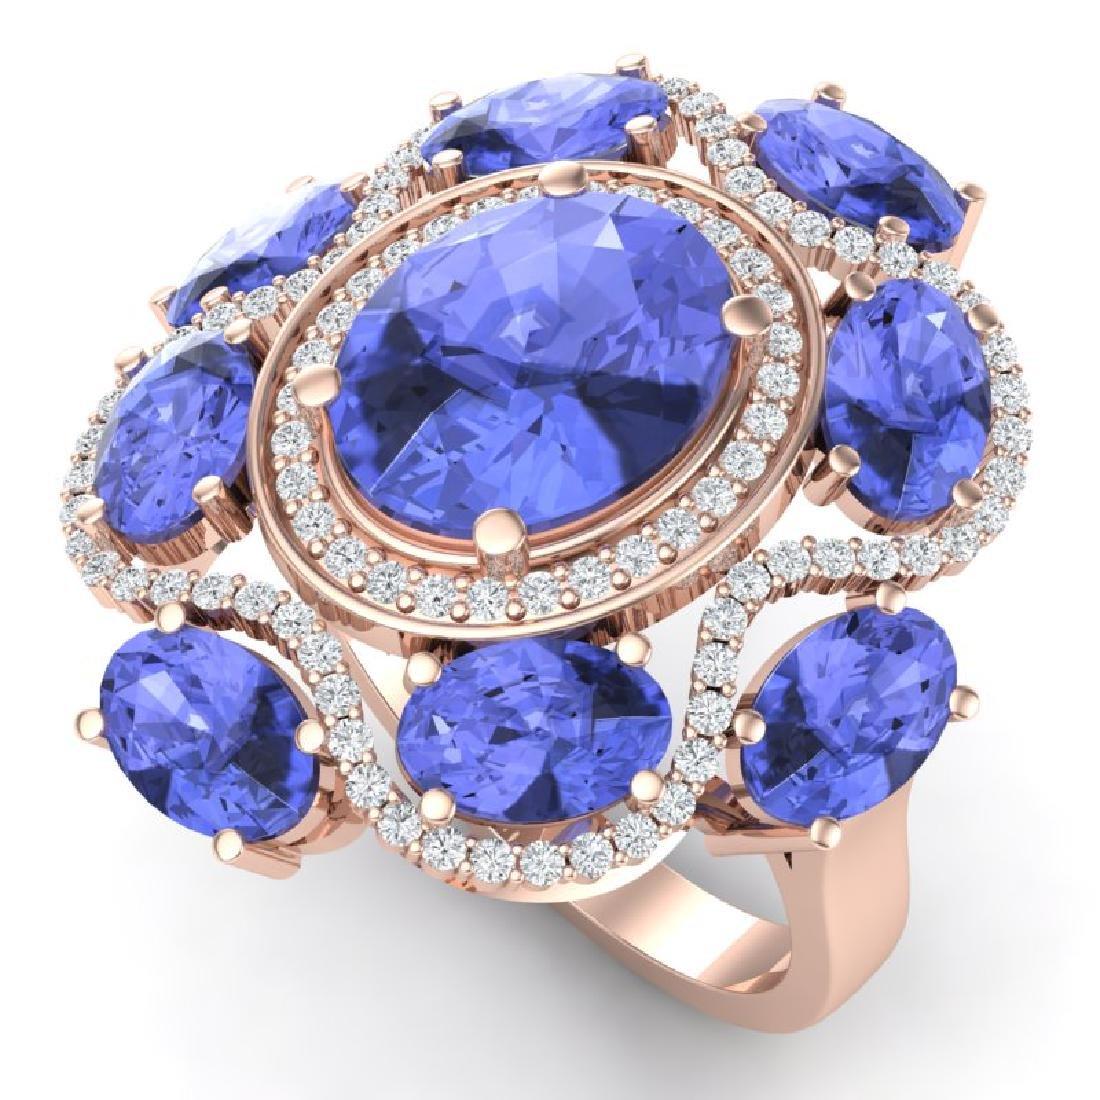 9.67 CTW Royalty Tanzanite & VS Diamond Ring 18K Rose